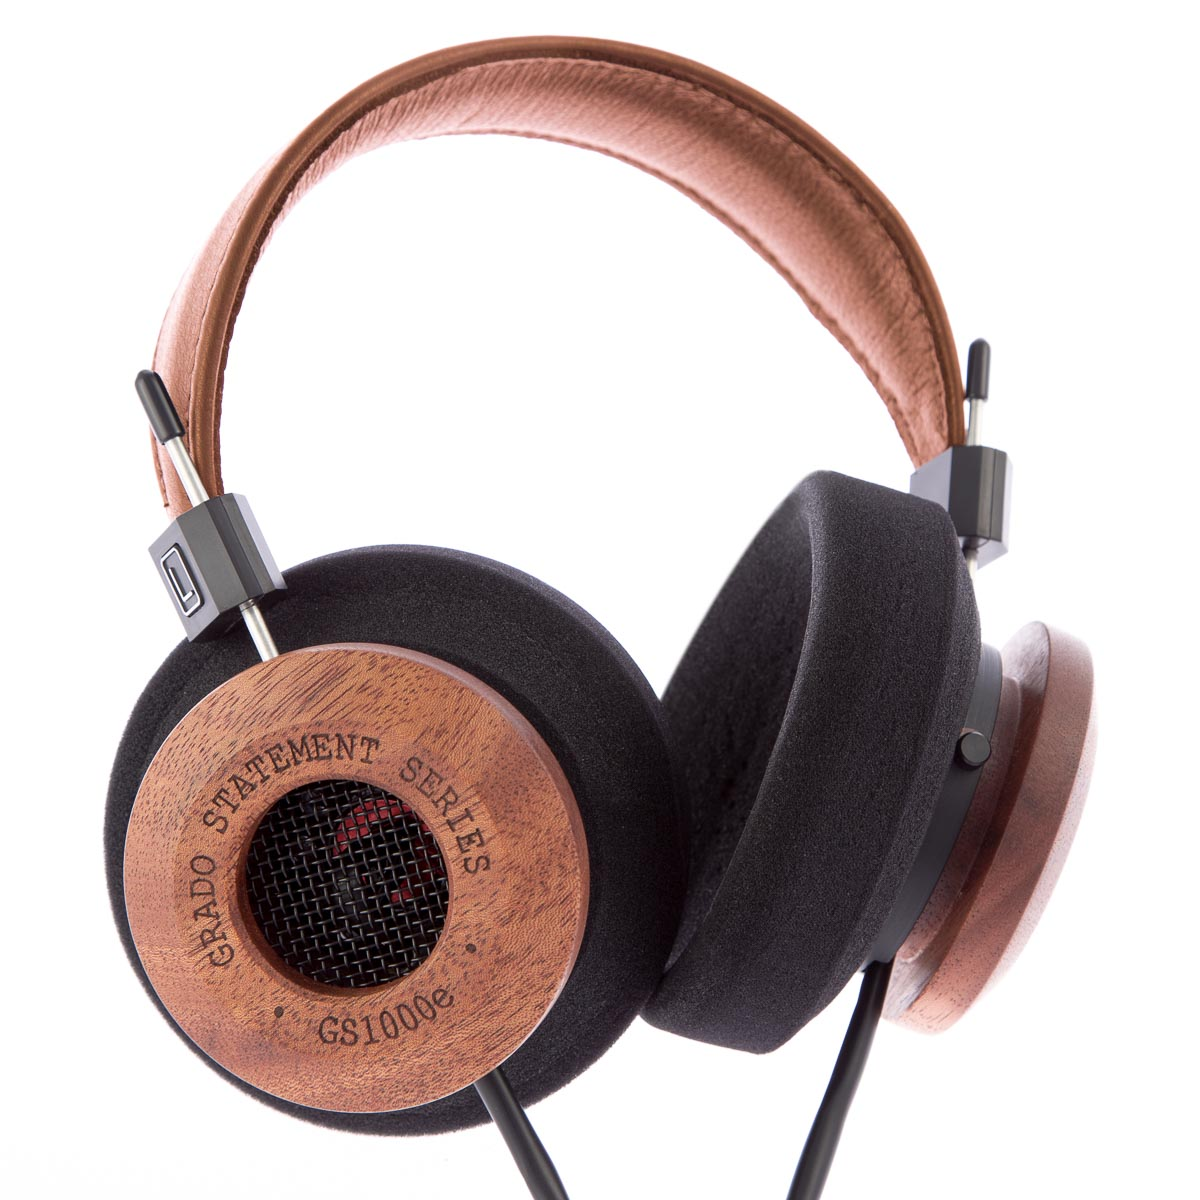 hight resolution of grado labs gs1000egrado headphones wiring diagram 5